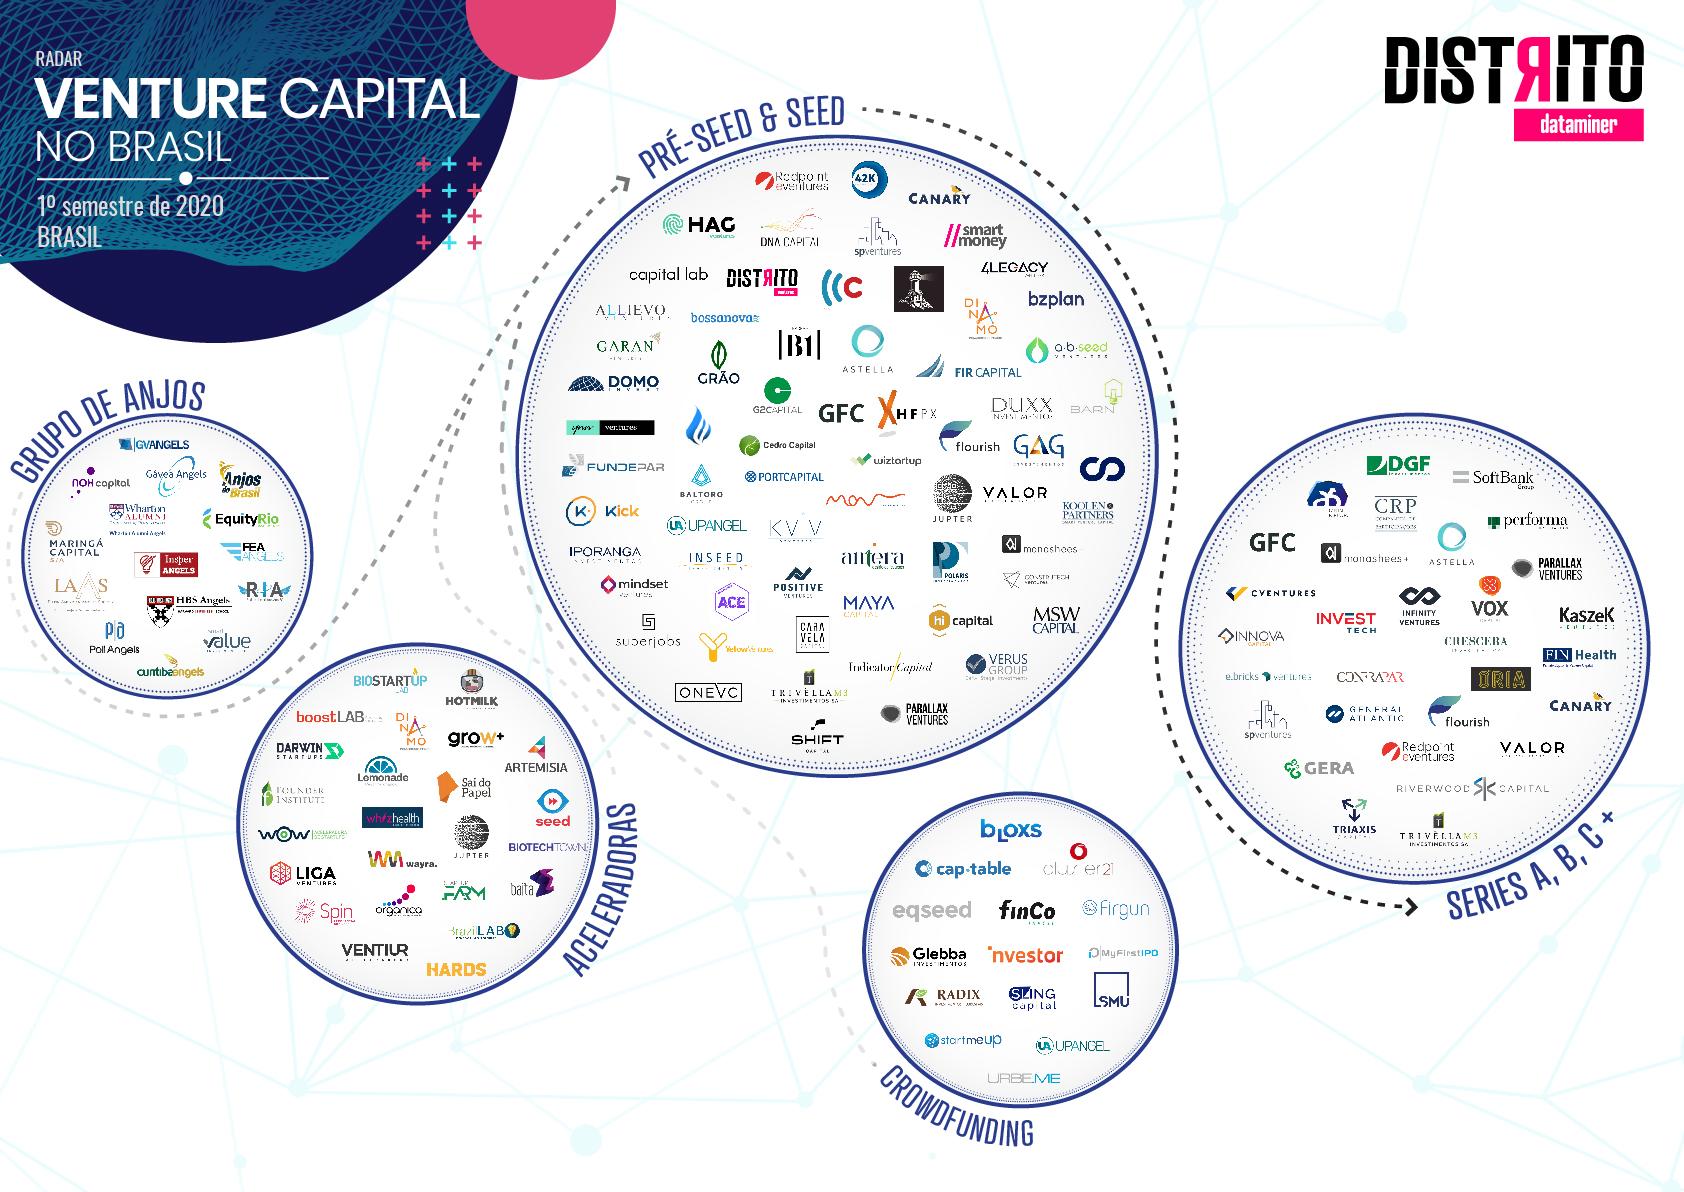 mapa do Venture Capital no Brasil